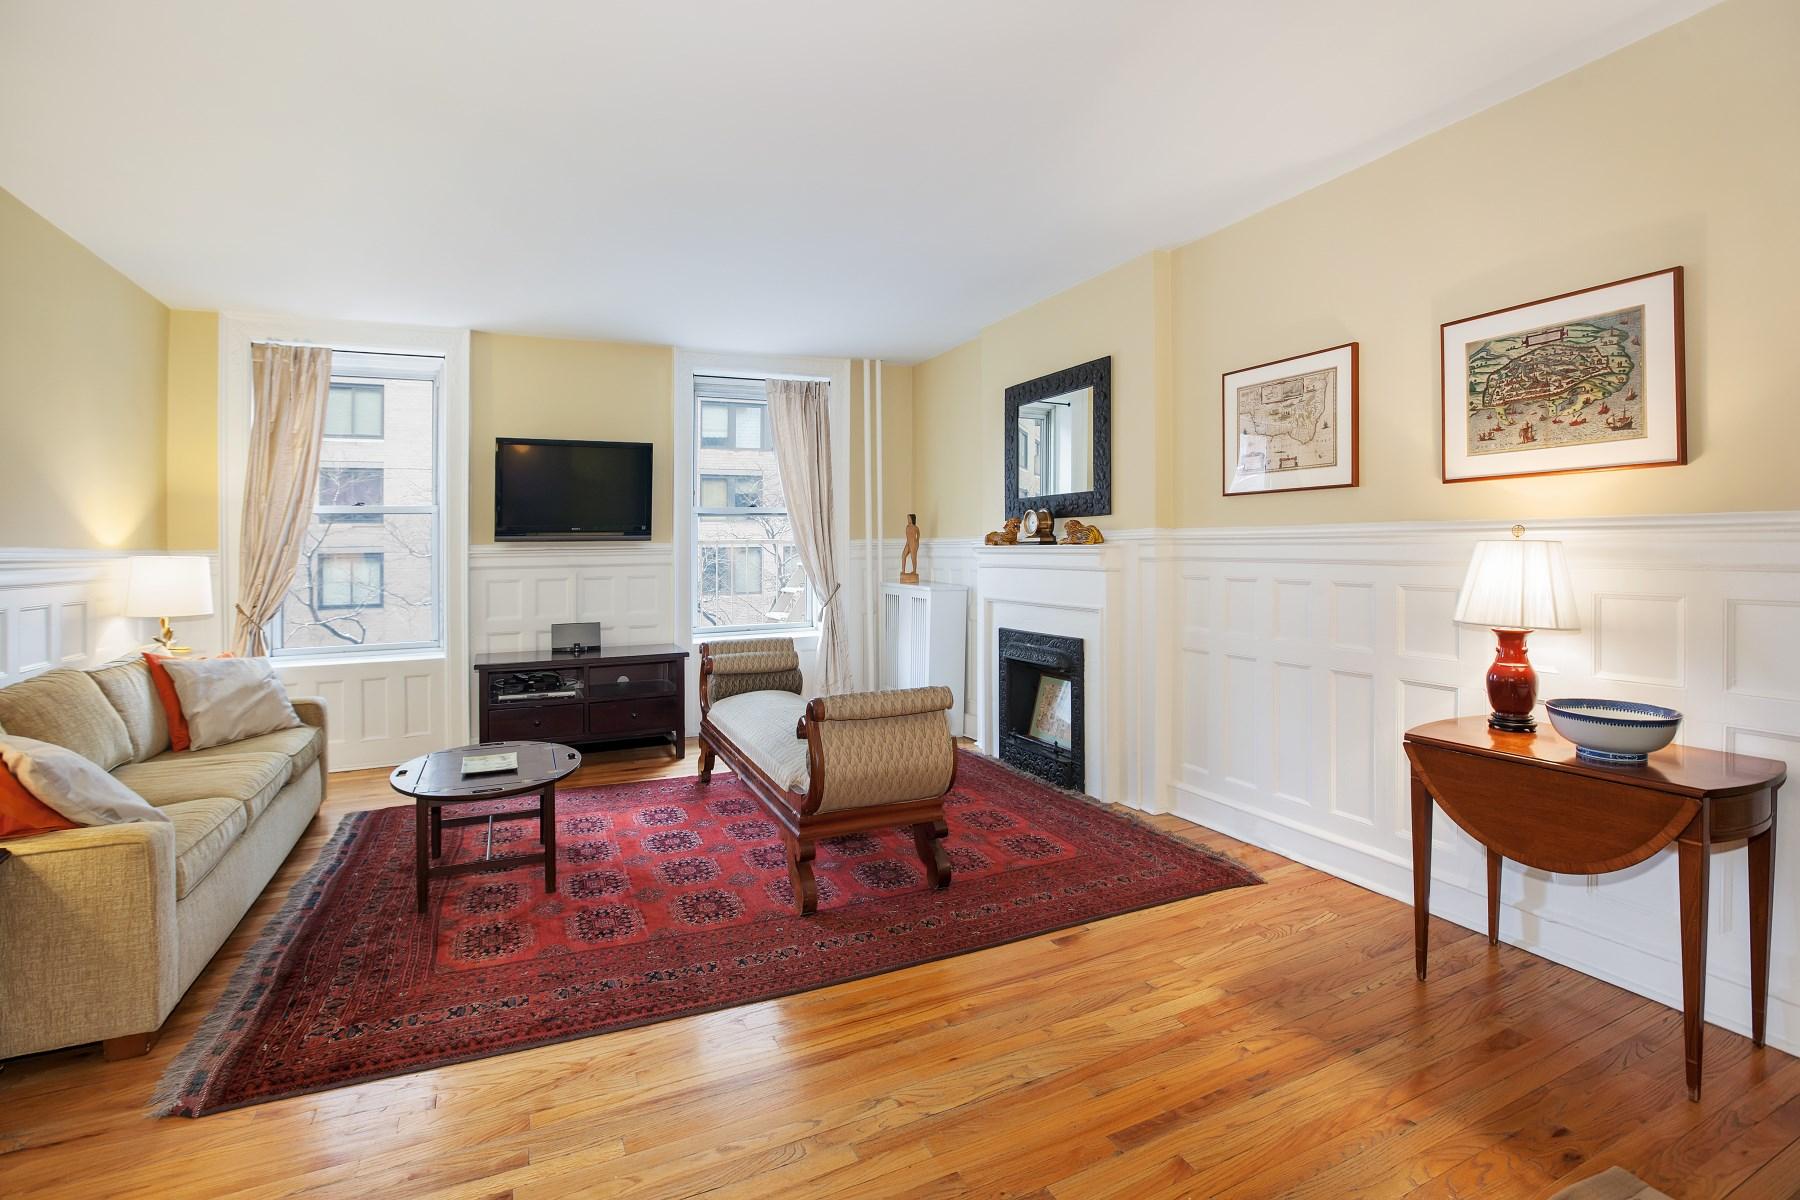 合作公寓 为 销售 在 1326 Madison Avenue, Apt 31 1326 Madison Avenue Apt 31 Upper East Side, 纽约, 纽约州, 10128 美国